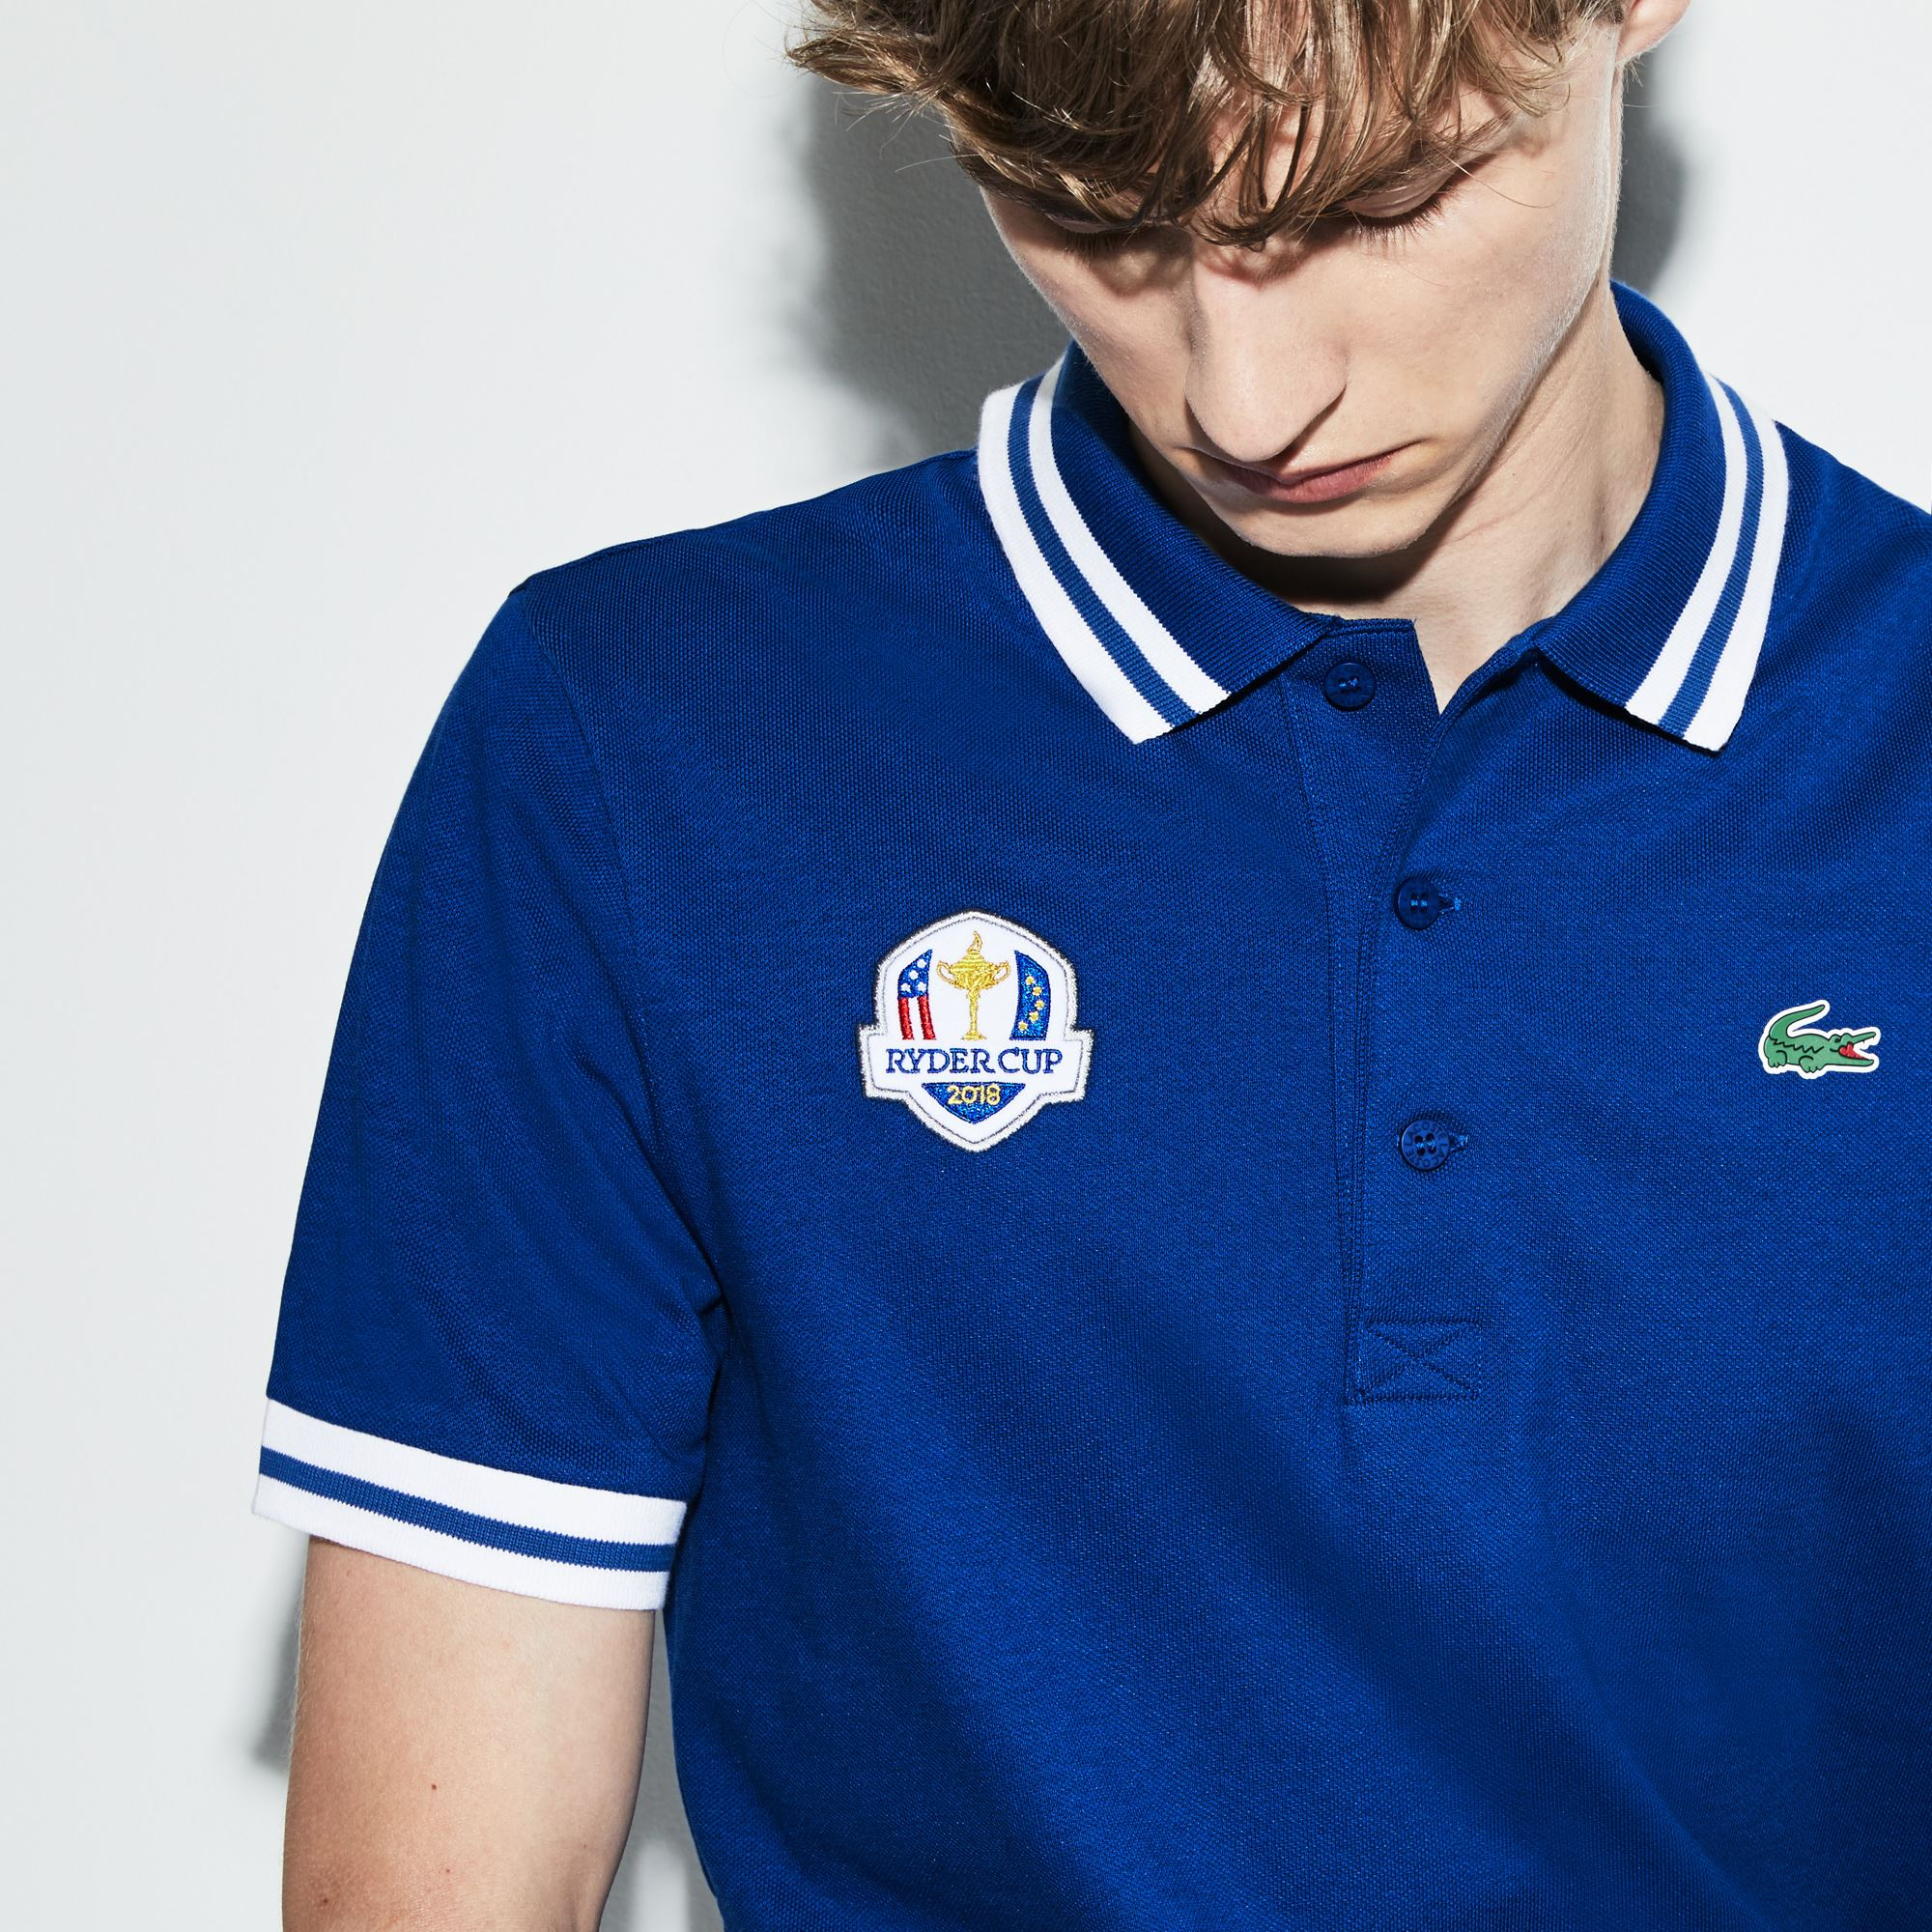 Lacoste - Herren LACOSTE SPORT Ryder Cup Edition Golf Poloshirt - 5